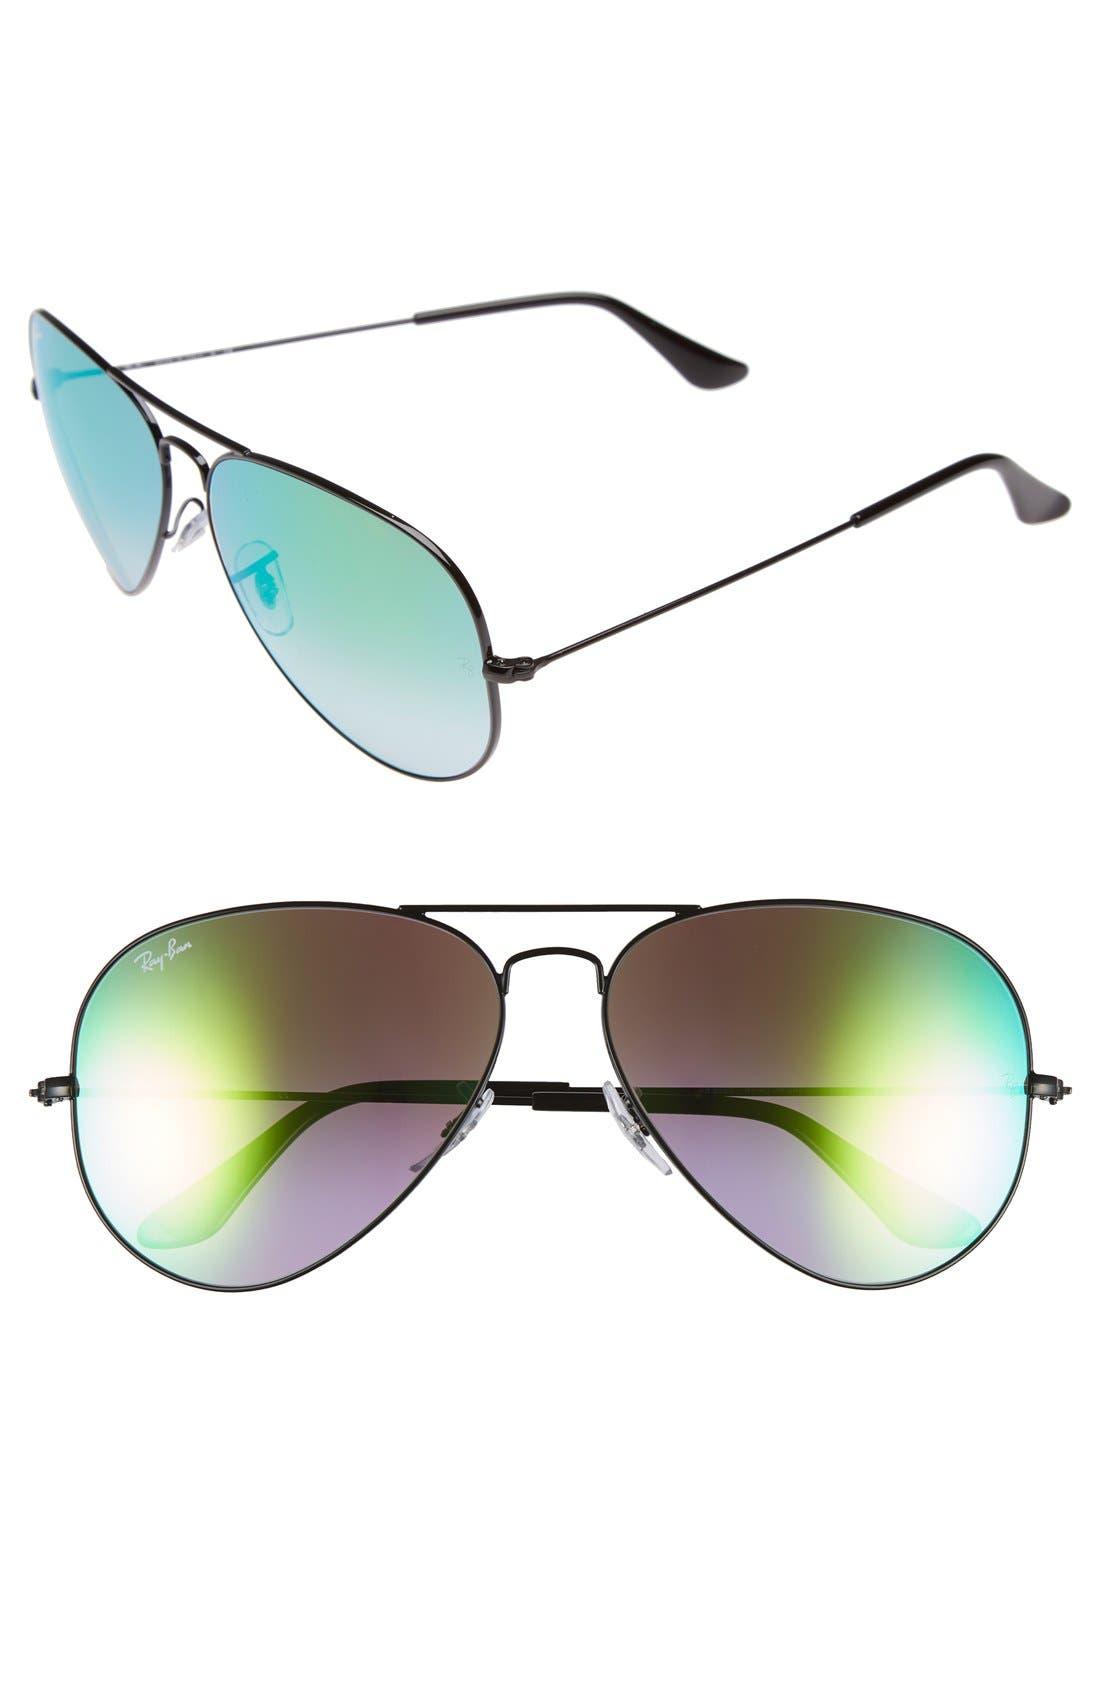 Large Icons 62mm Aviator Sunglasses,                             Main thumbnail 1, color,                             Black/ Green